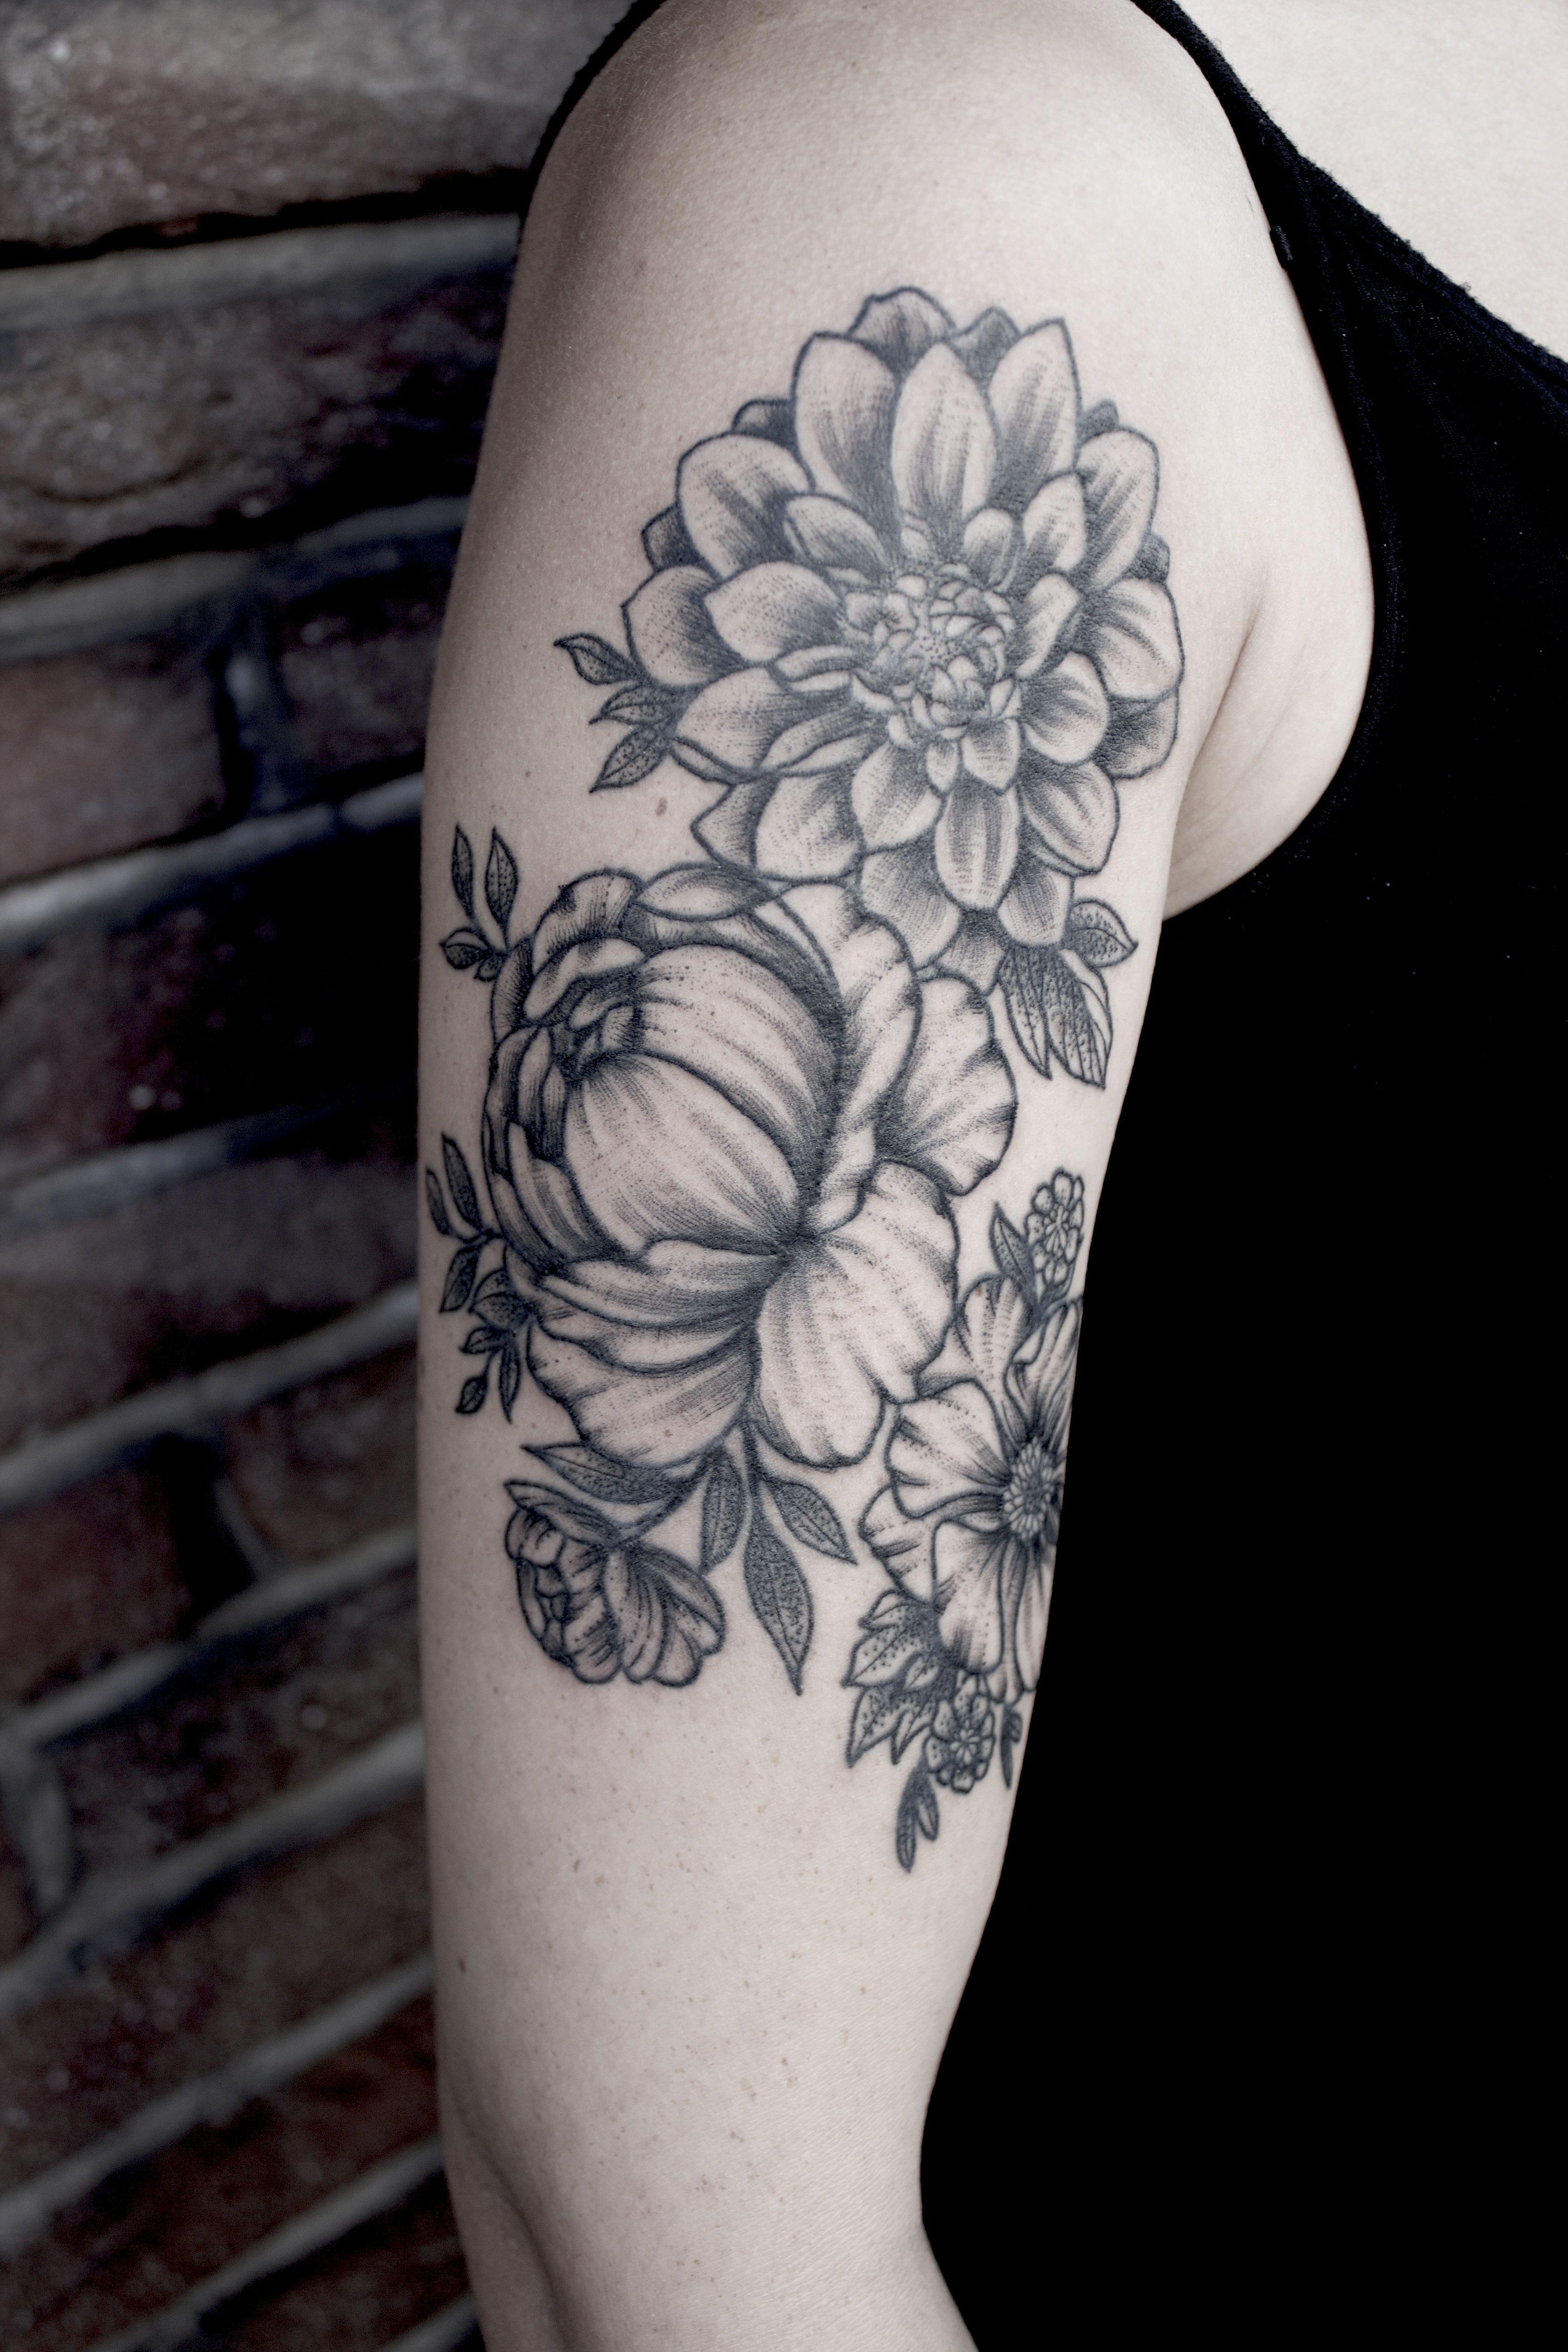 Bebi tatu kozelrol 526 - Peony Tattoo Dotwork Blackwork Flower Botanical Bouquet Chrysantheme Neo Traditional Peonies